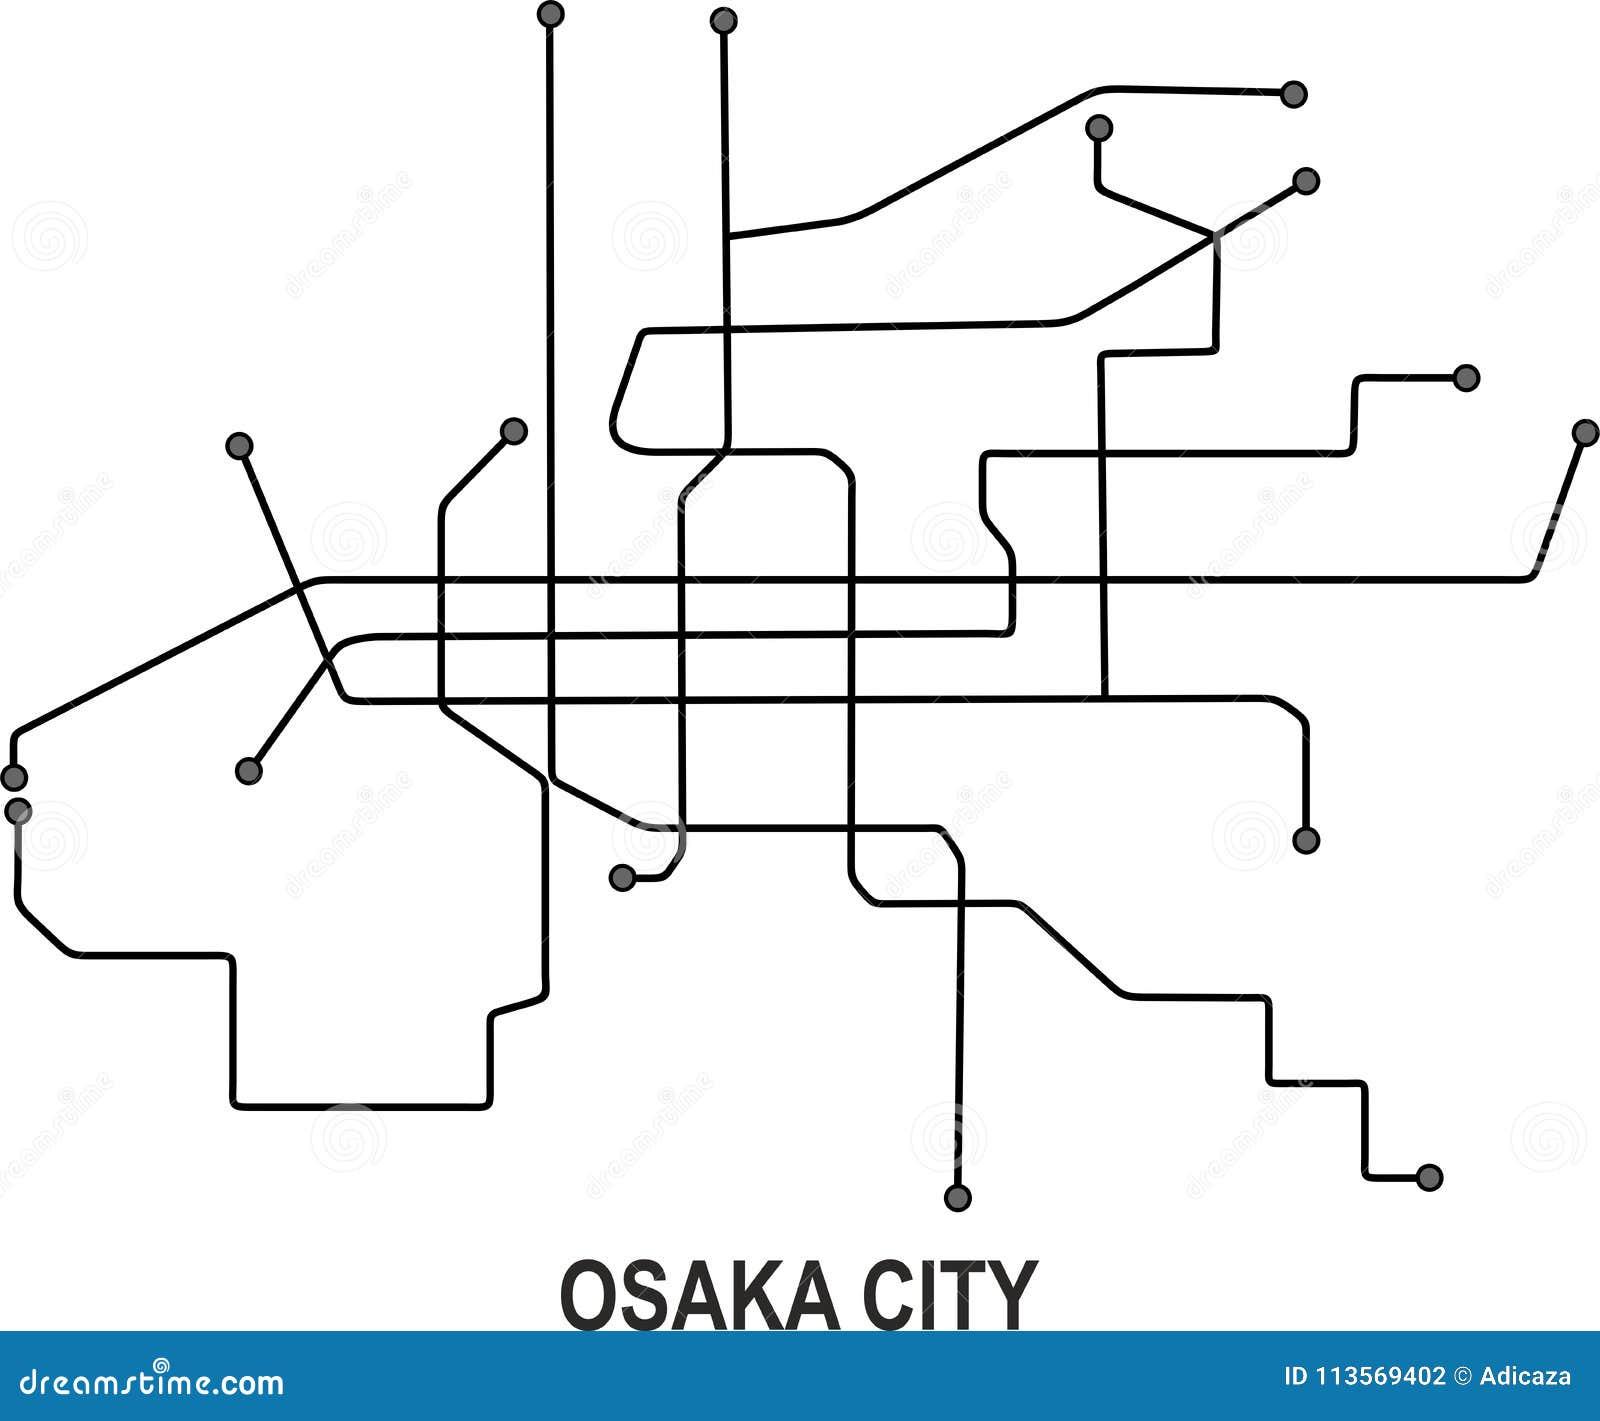 Subway Map Of Osaka.Osaka City Map Stock Vector Illustration Of Subway 113569402